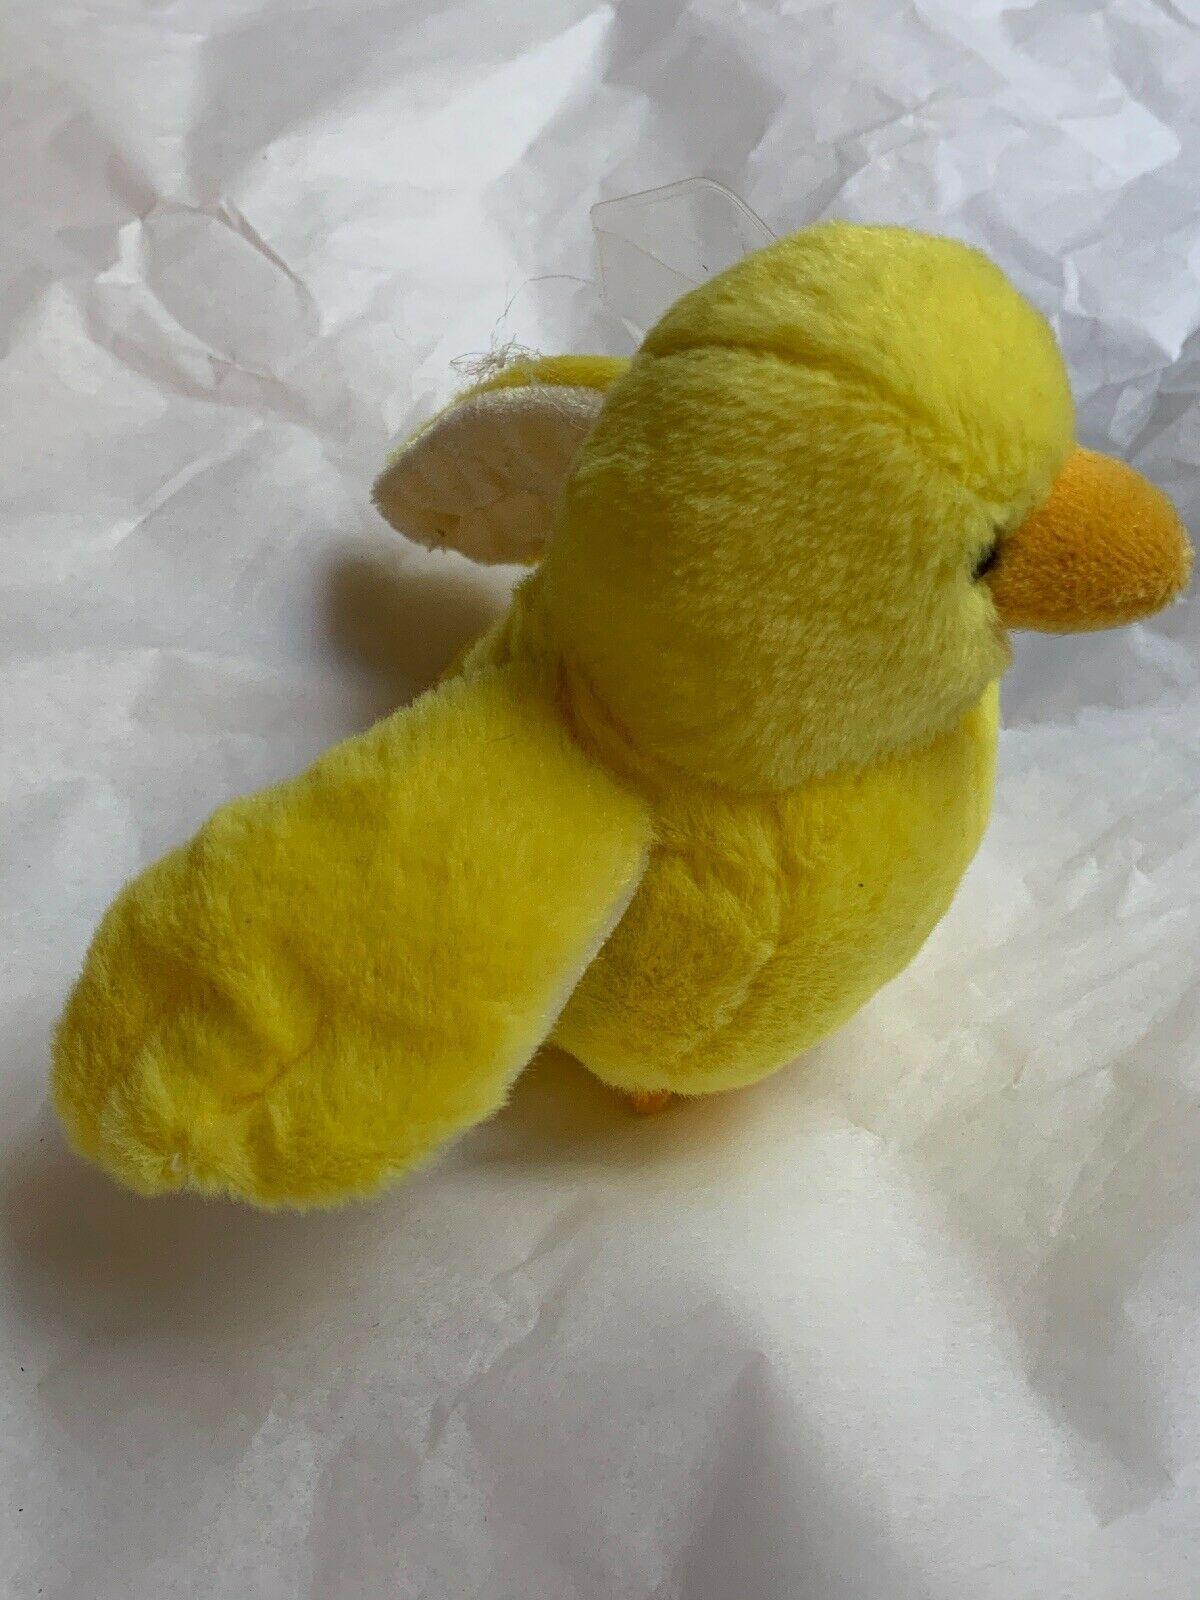 ganz webkinz lil kinz yellow canary bird plush w Code Card • Used Doll Toy Cute image 3